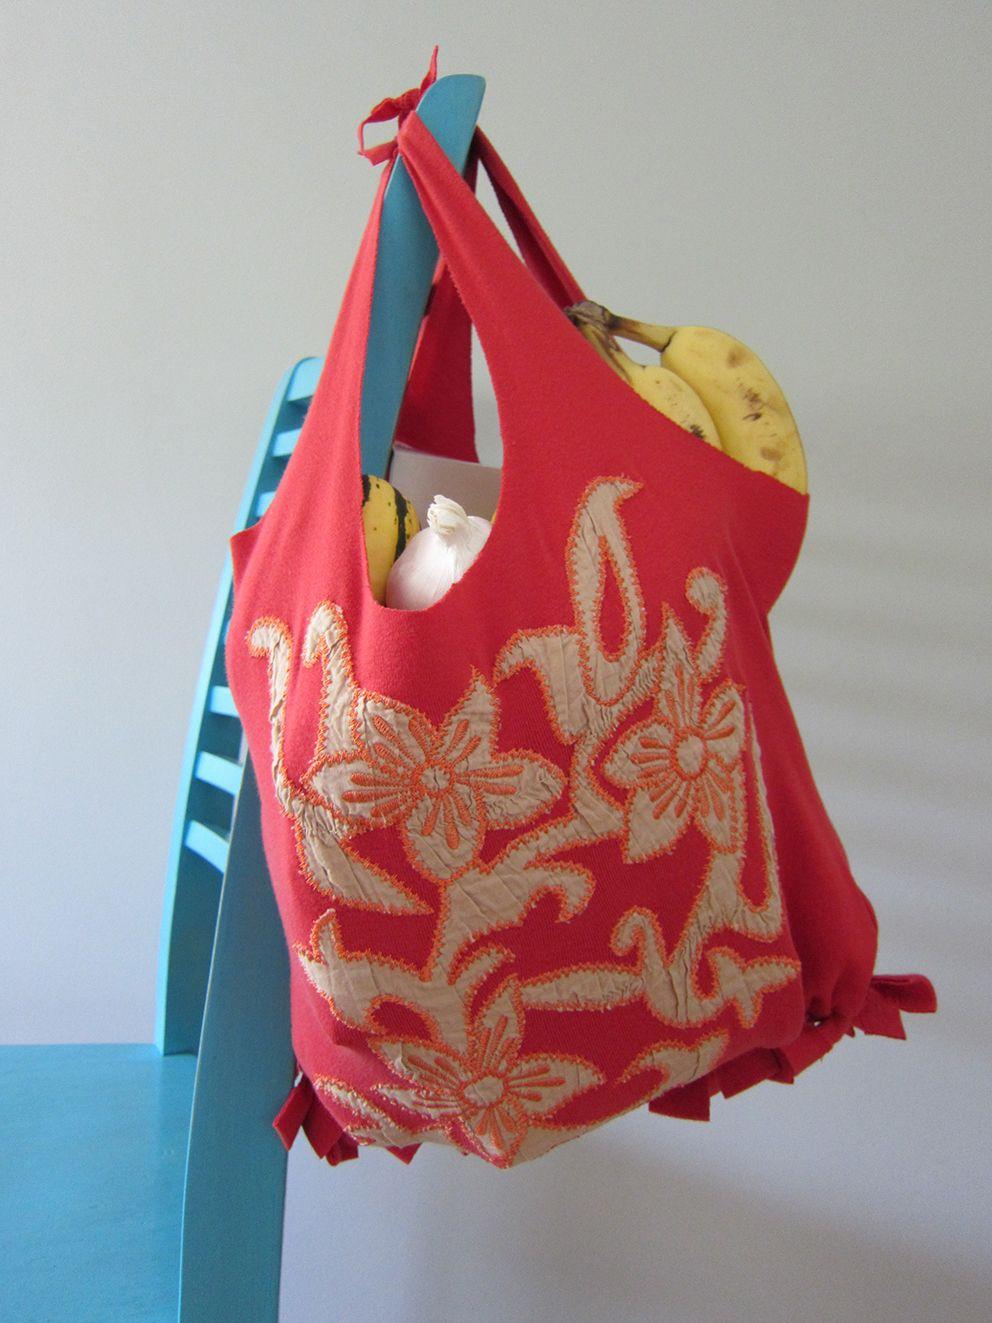 Cara Mengakali Fashion Item yang Kekecilan, Wajib Tahu!